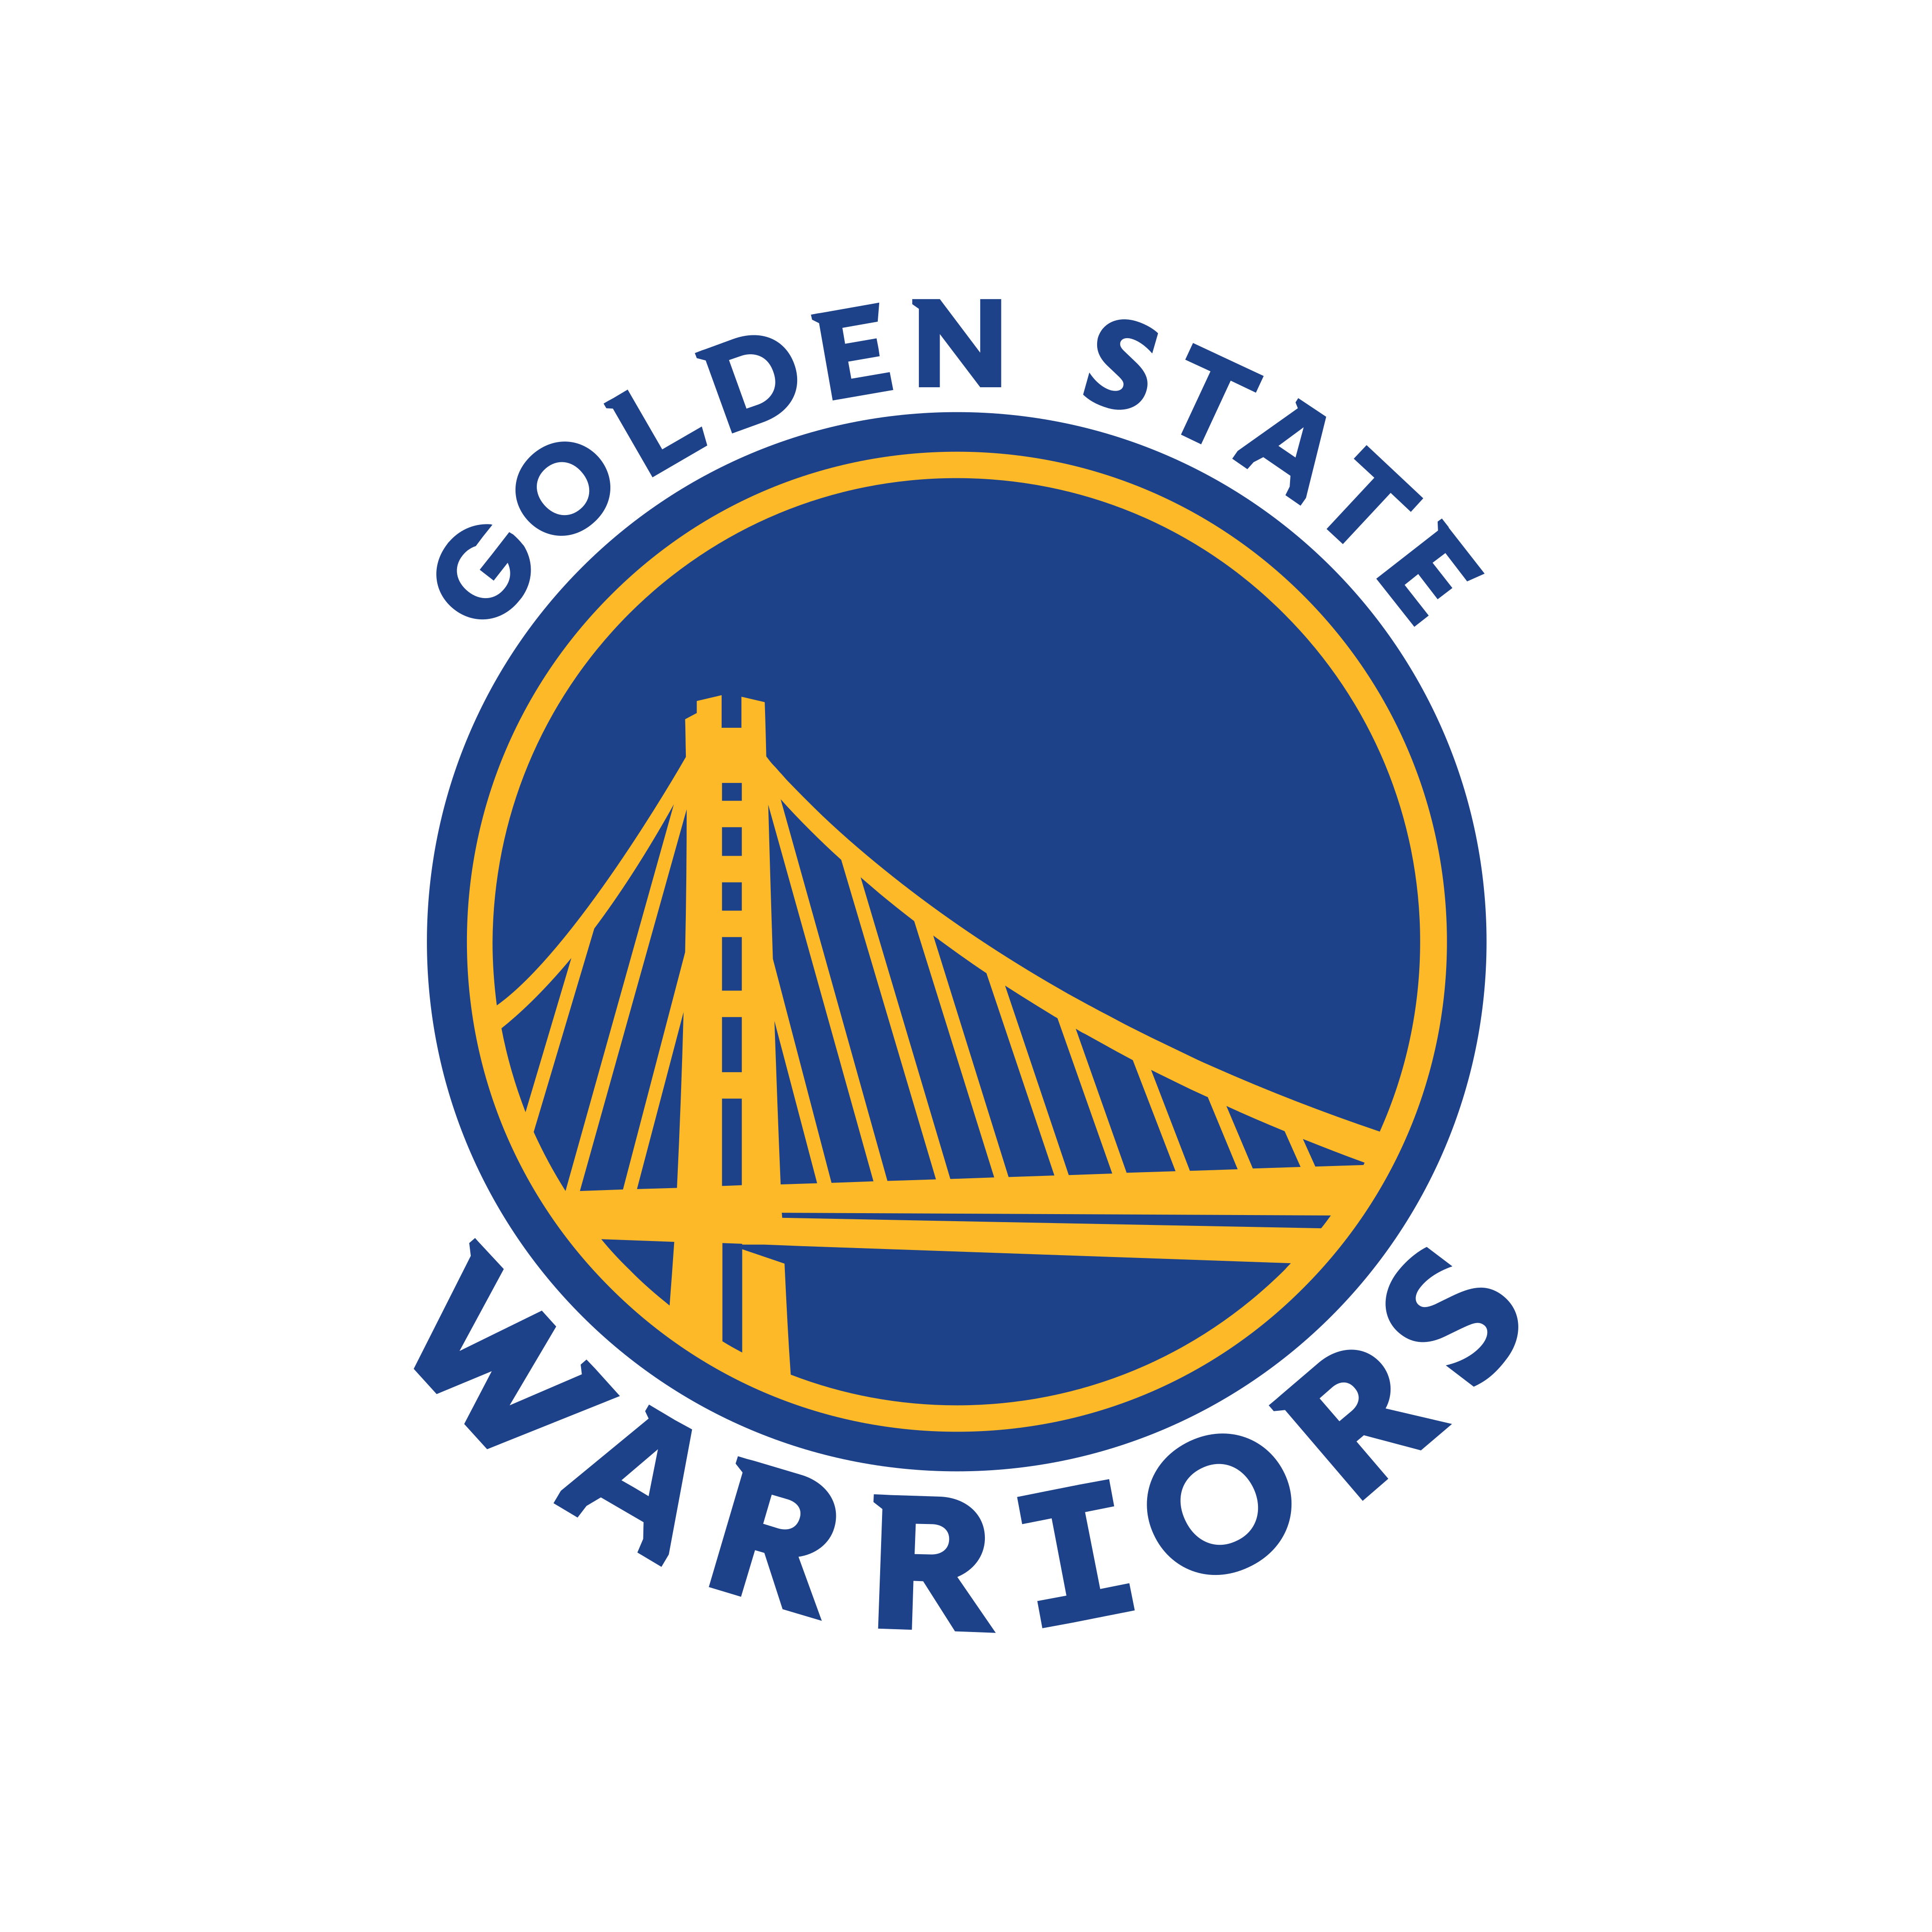 golden state warriors logo 0 1 - Golden State Warriors Logo